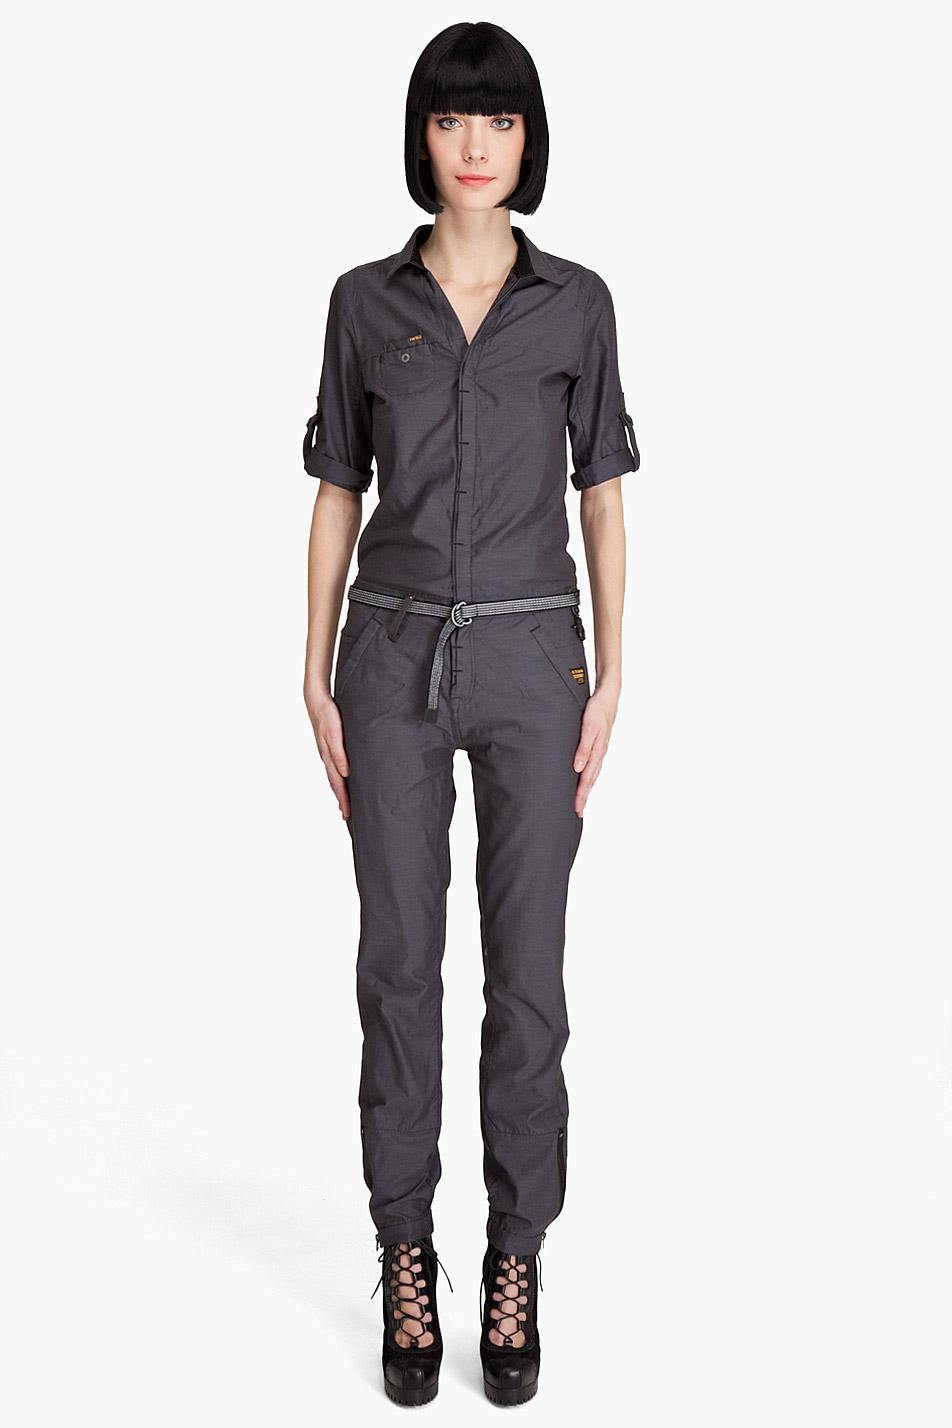 g star raw flight deck jumpsuit in gray petrol lyst. Black Bedroom Furniture Sets. Home Design Ideas